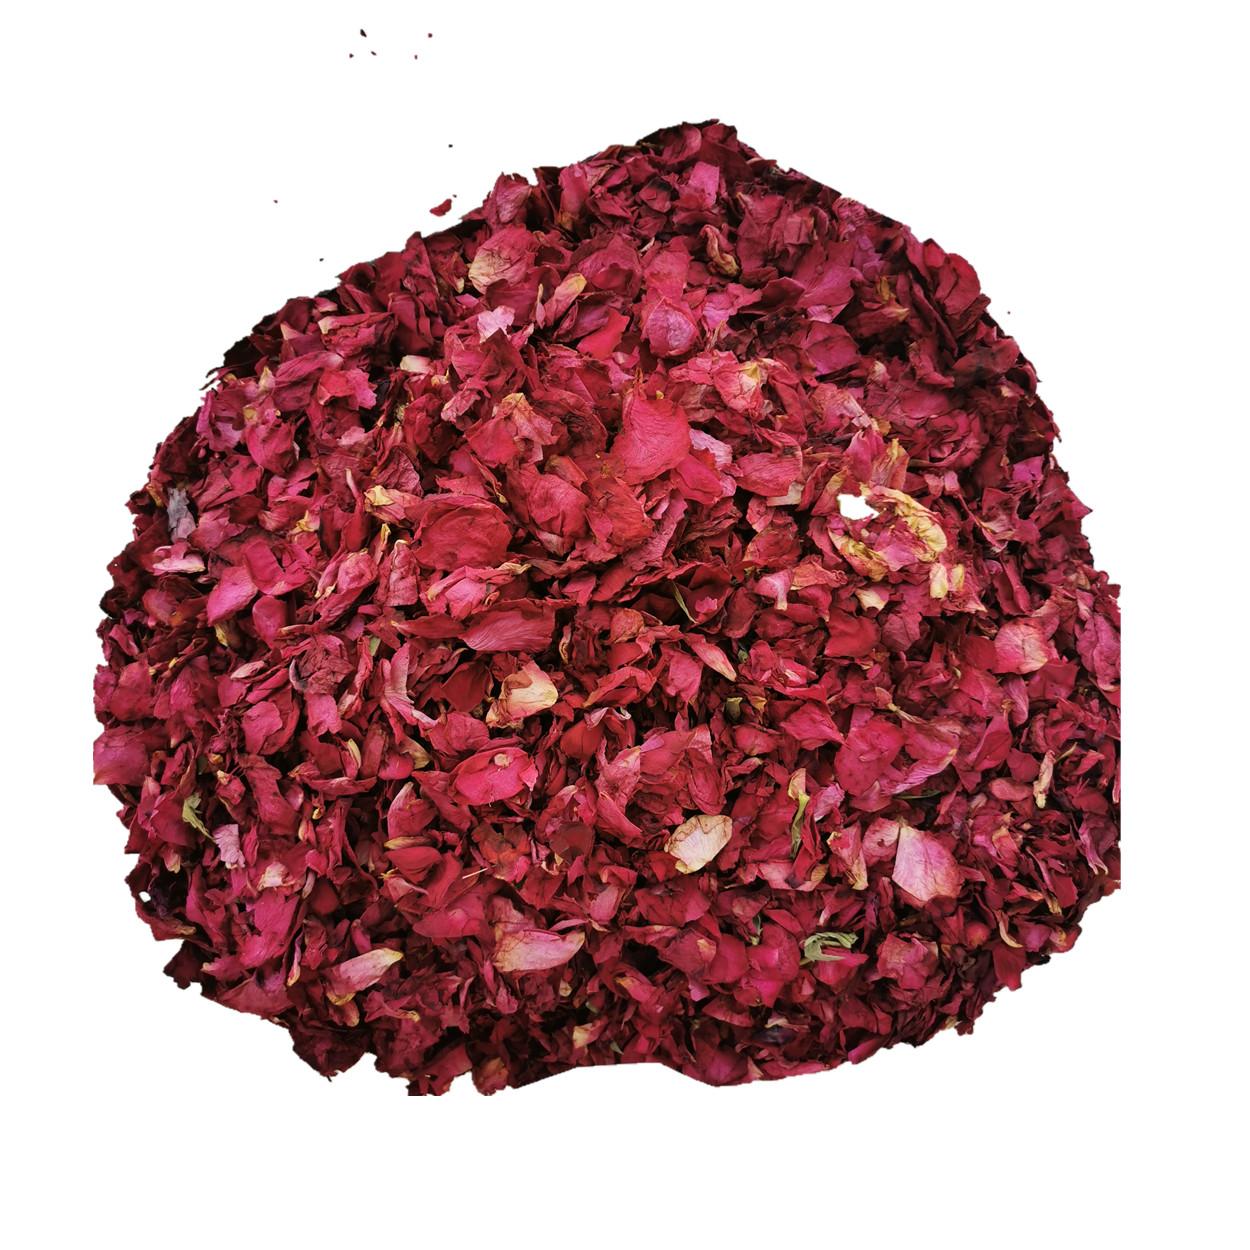 100% Natural Dried Rose Petals Real Dried Petales de Roses for Infusion Organic Pink Rose Petals for Bath and Beauty - 4uTea | 4uTea.com